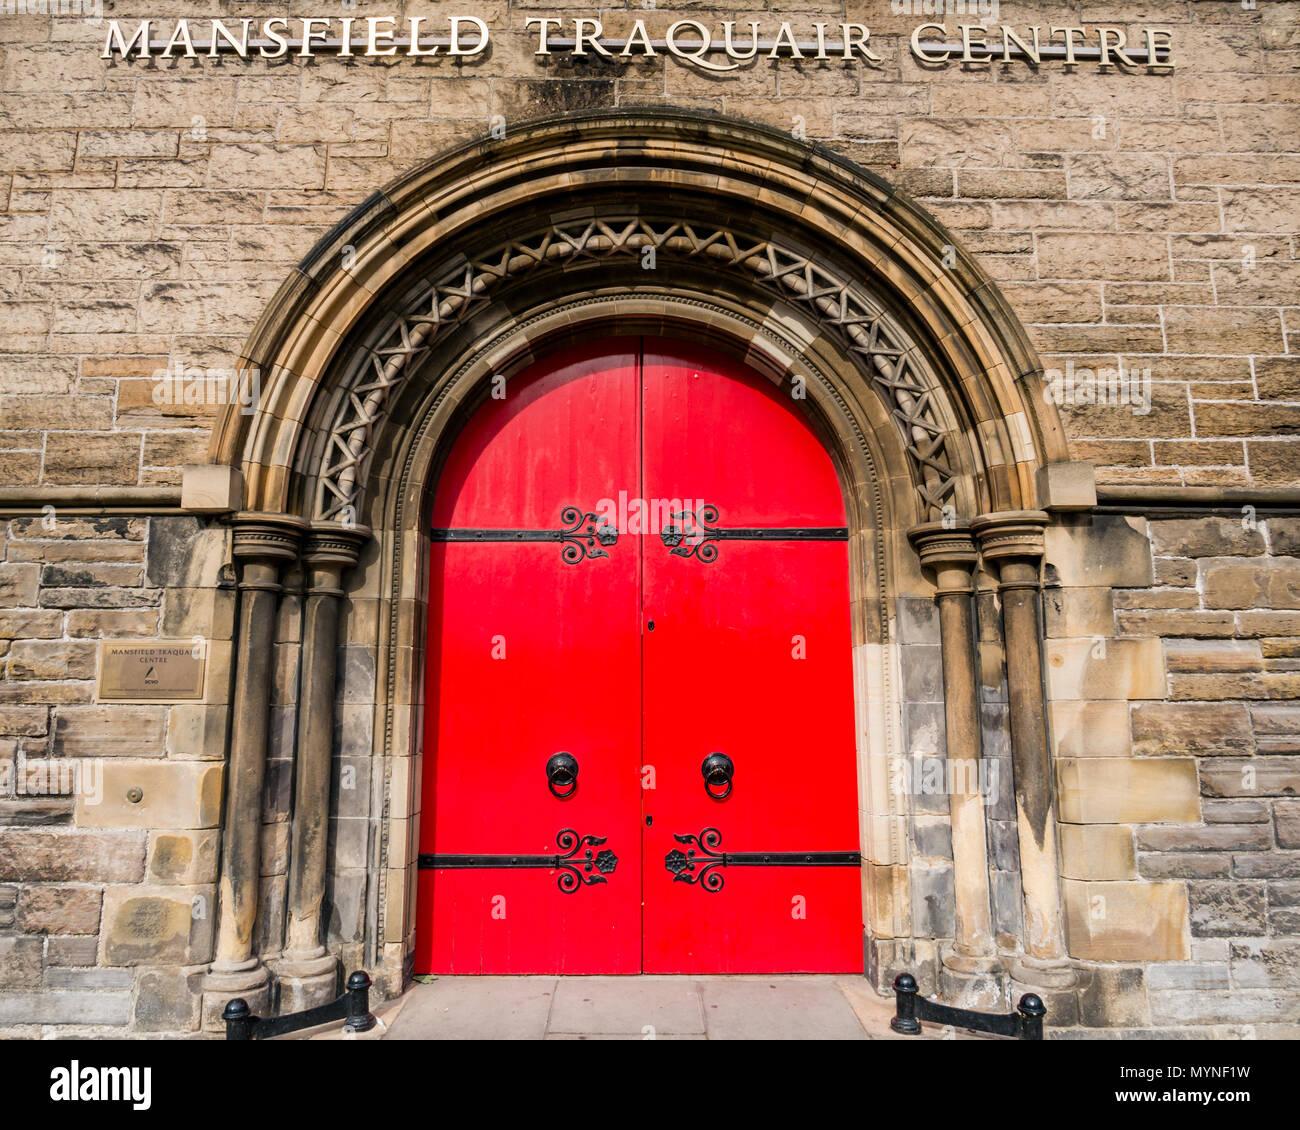 Bright red ornate arched door with elaborate hinges, Mansfield Traquair Centre, SCVO headquarters, Edinburgh, Scotland, UK - Stock Image